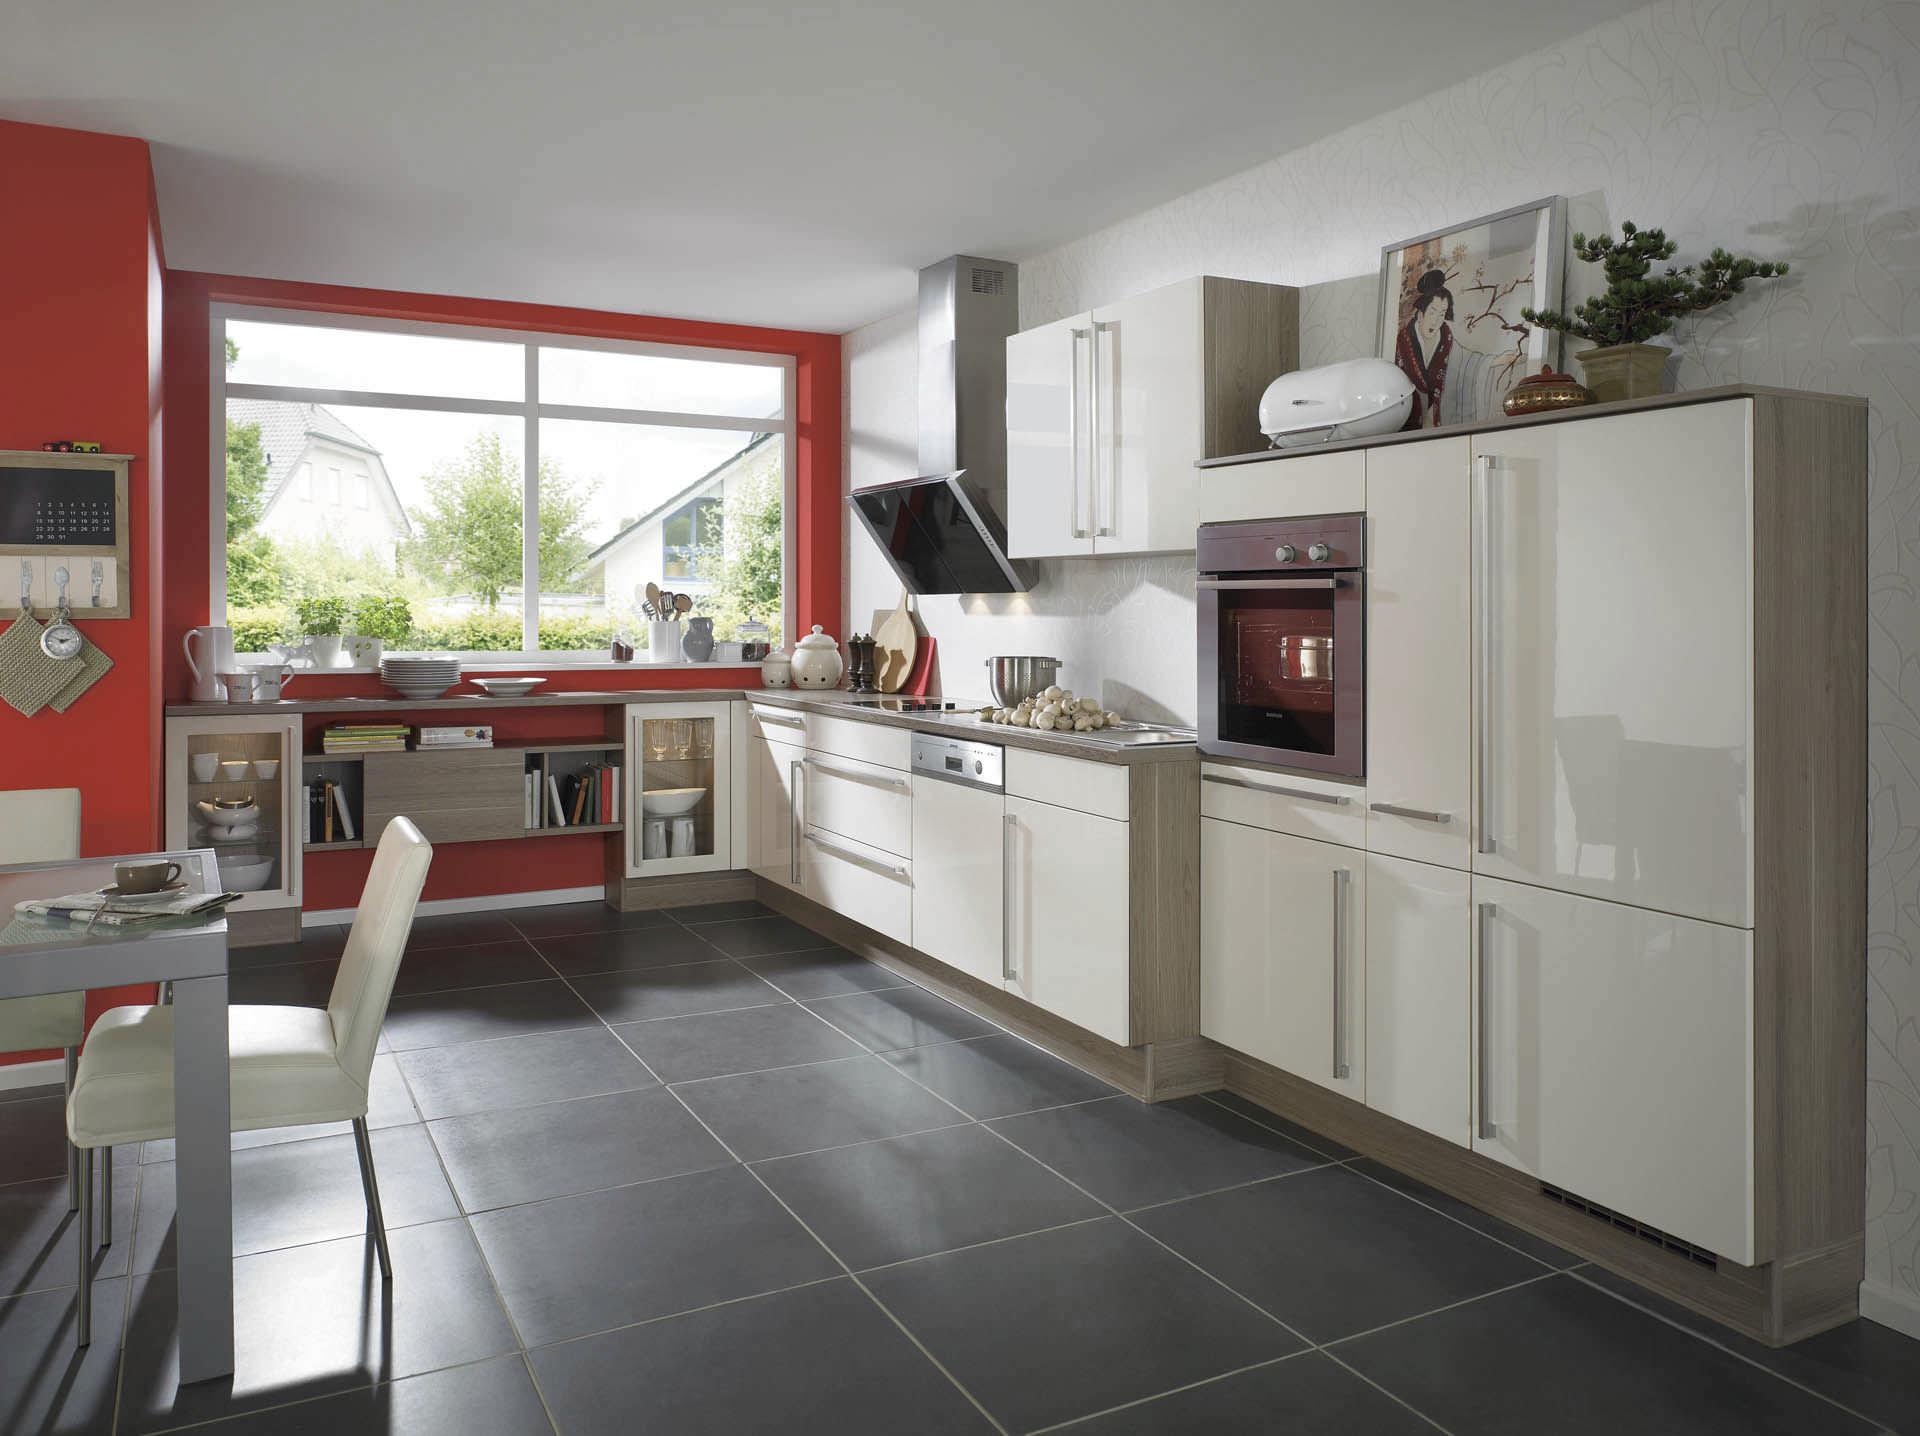 Moderne Landhausküche Nobilia | wotzc.com